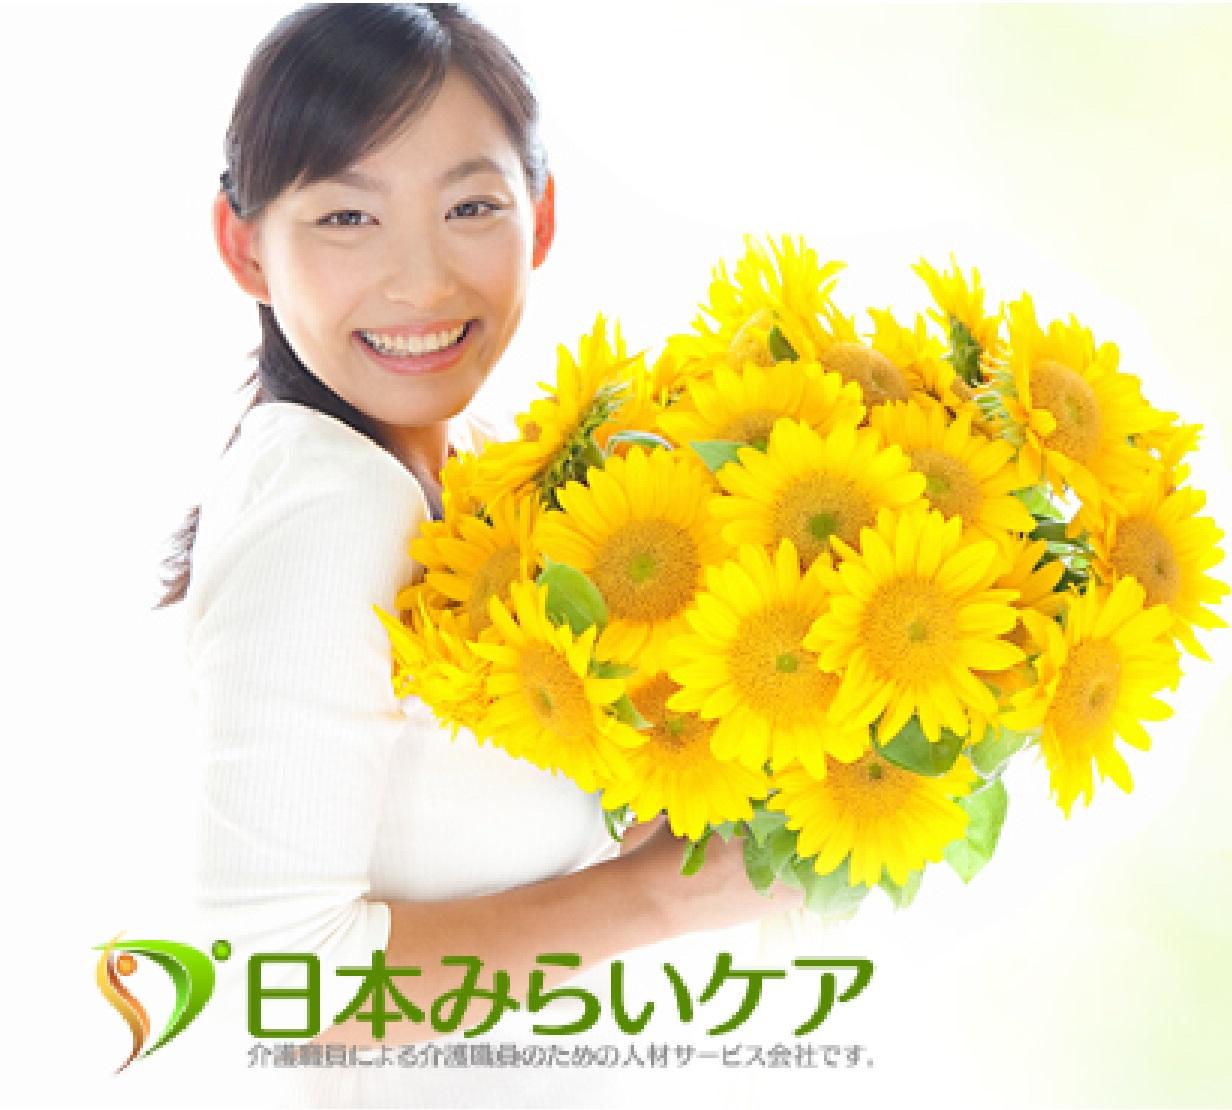 kaigo_mirai.jpg